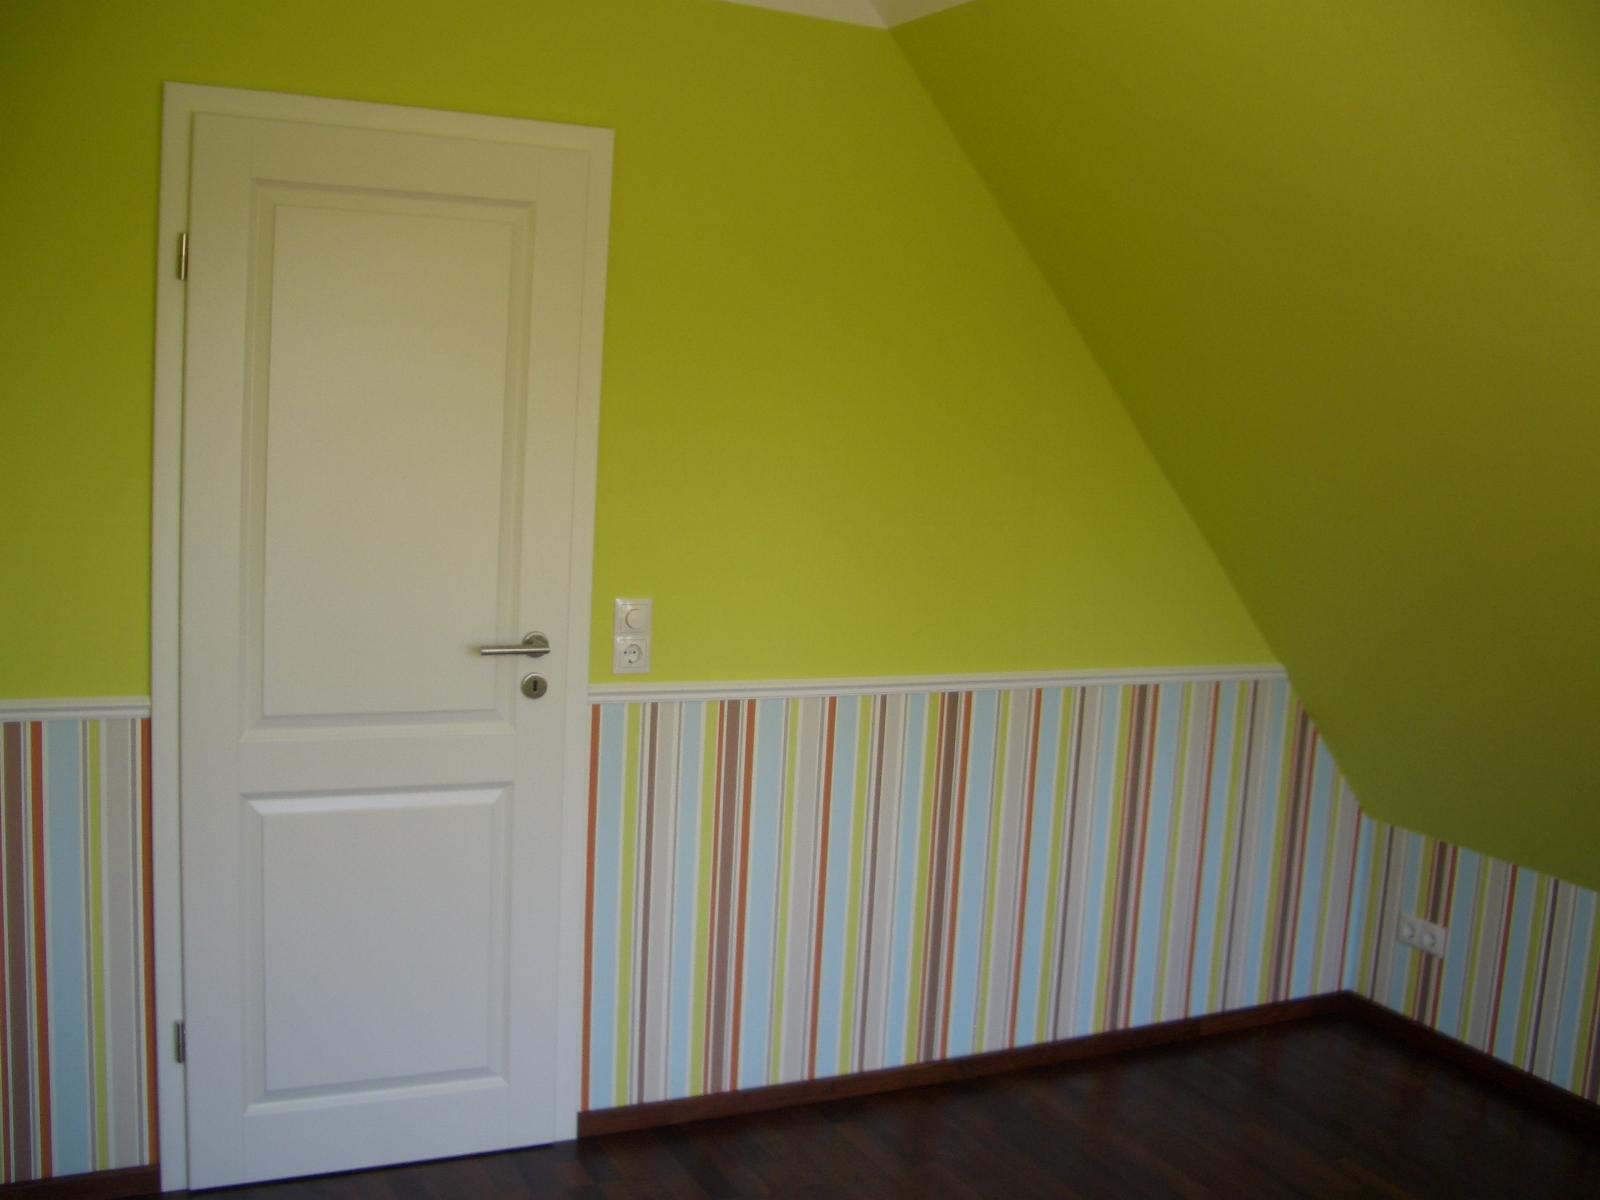 ferrow and ball ahrens malereibetrieb. Black Bedroom Furniture Sets. Home Design Ideas